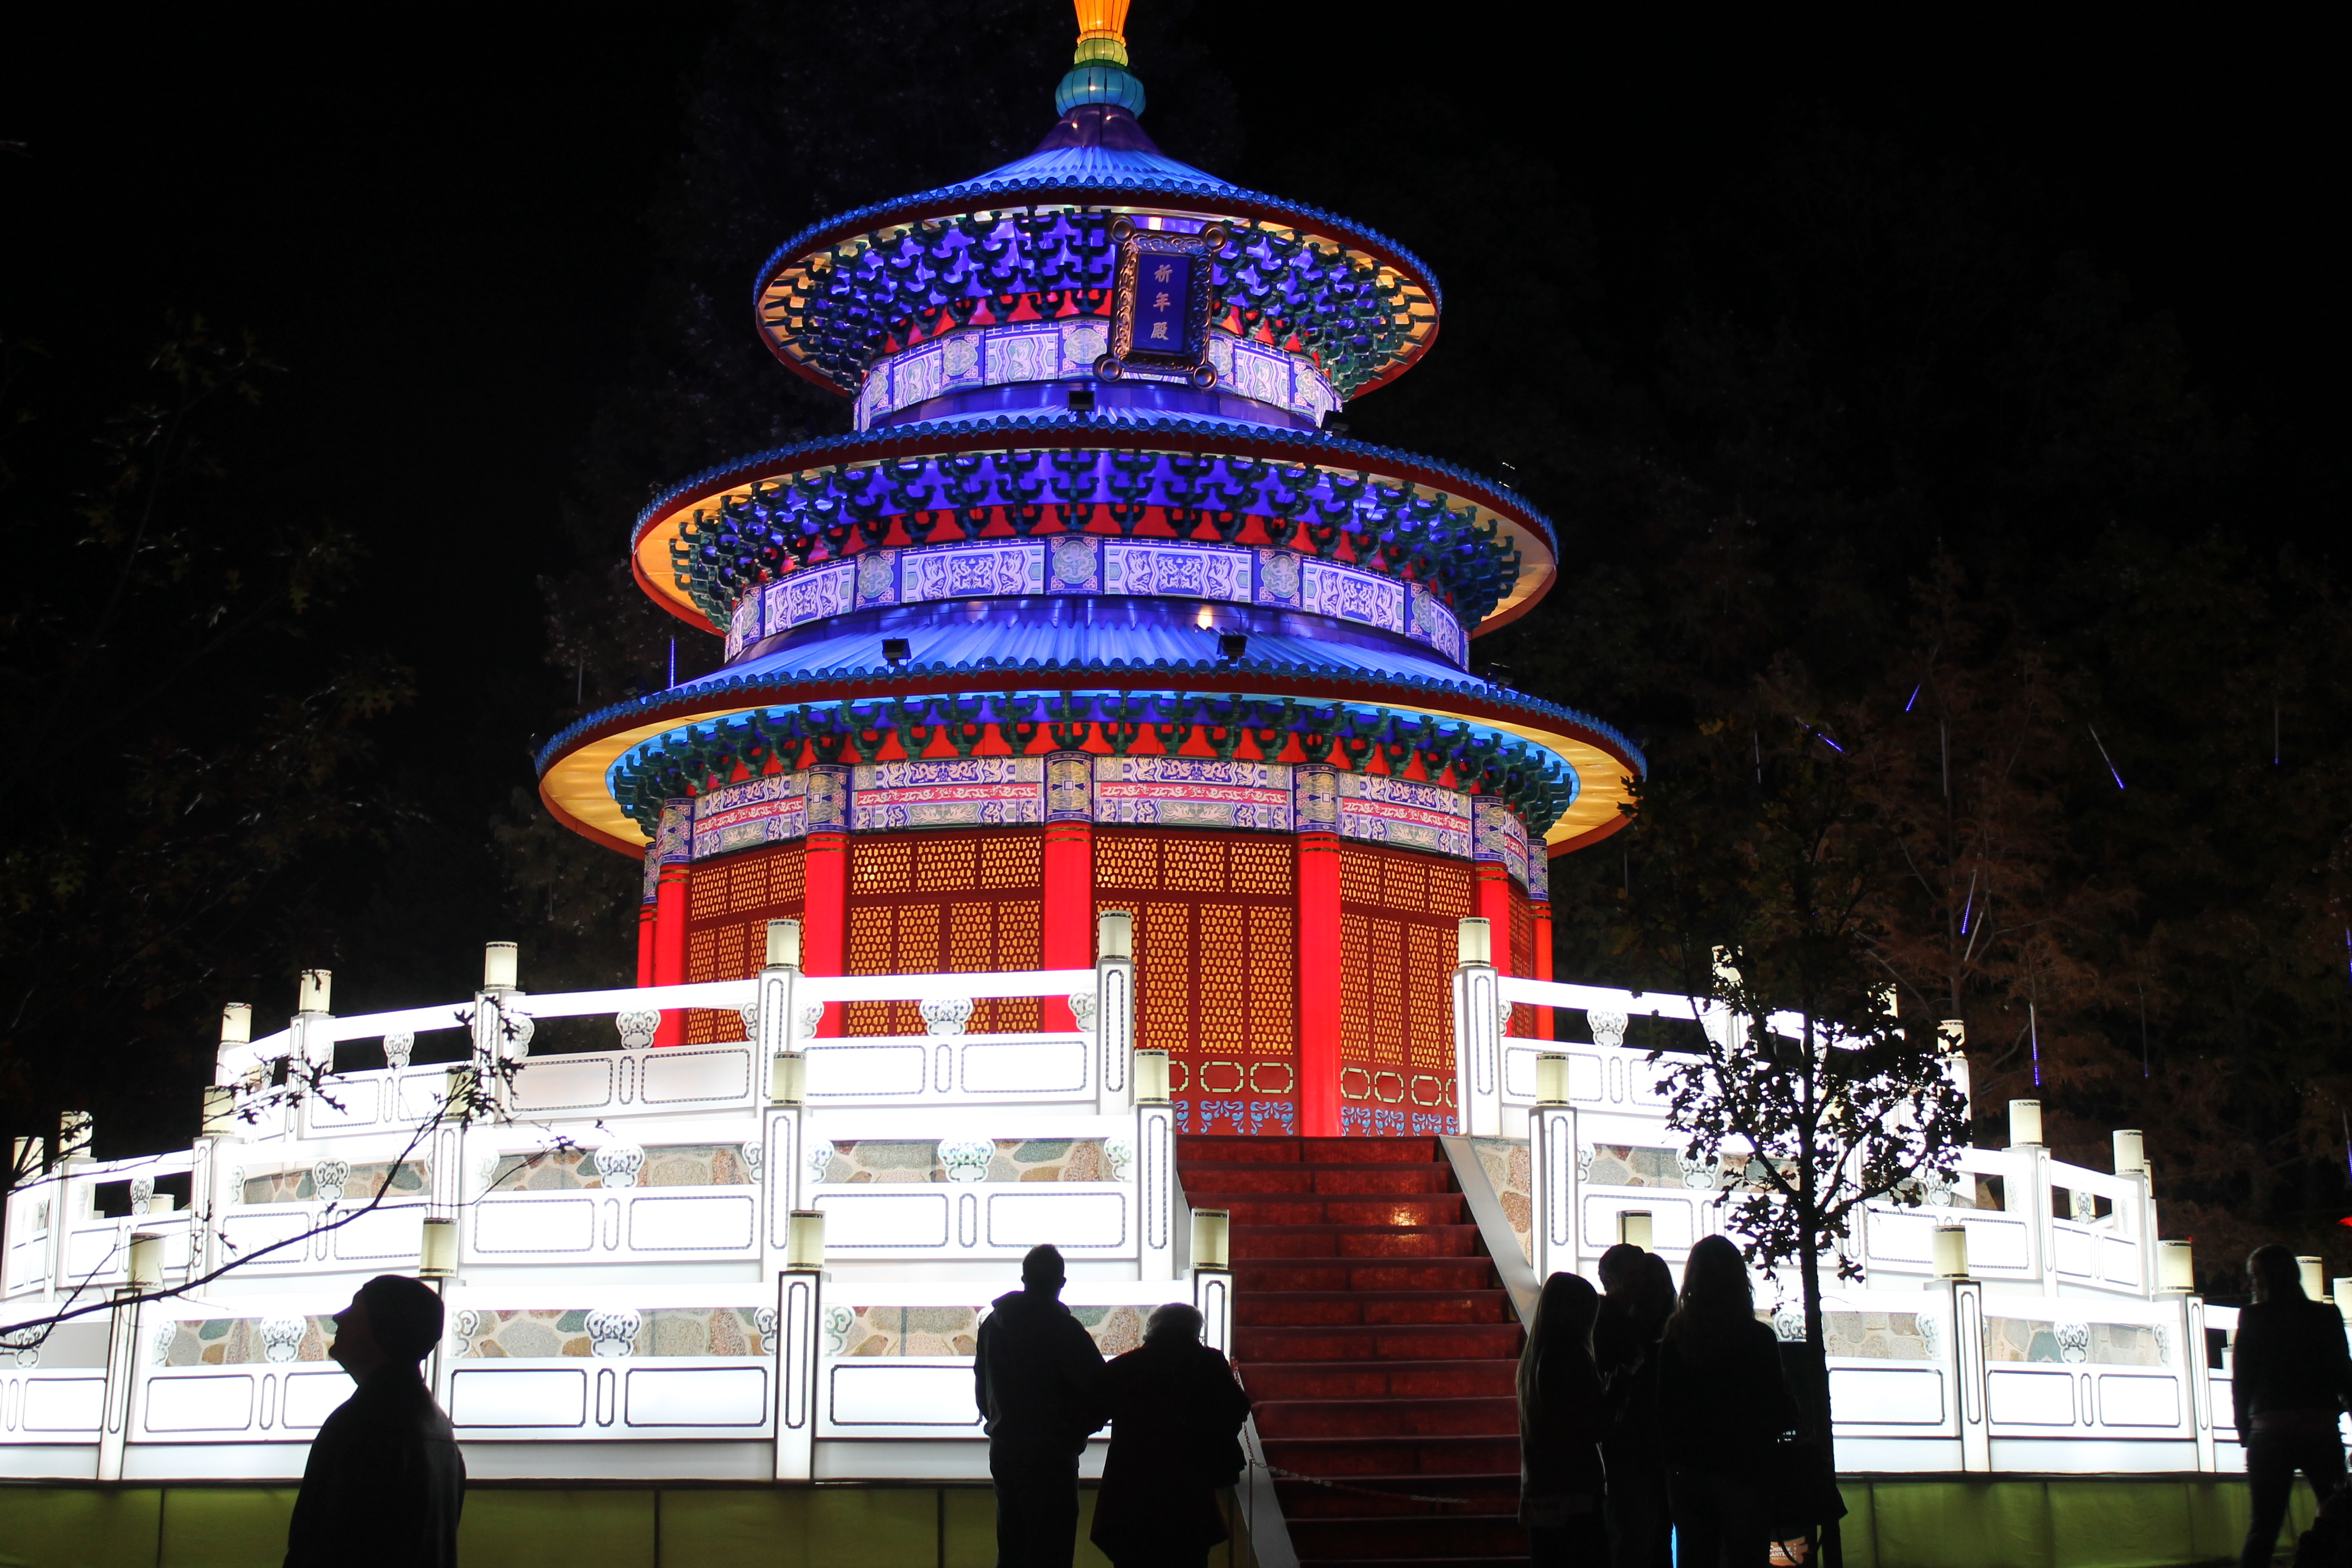 The Chinese Lantern Festival dazzles in Fair Park | Dallas Voice